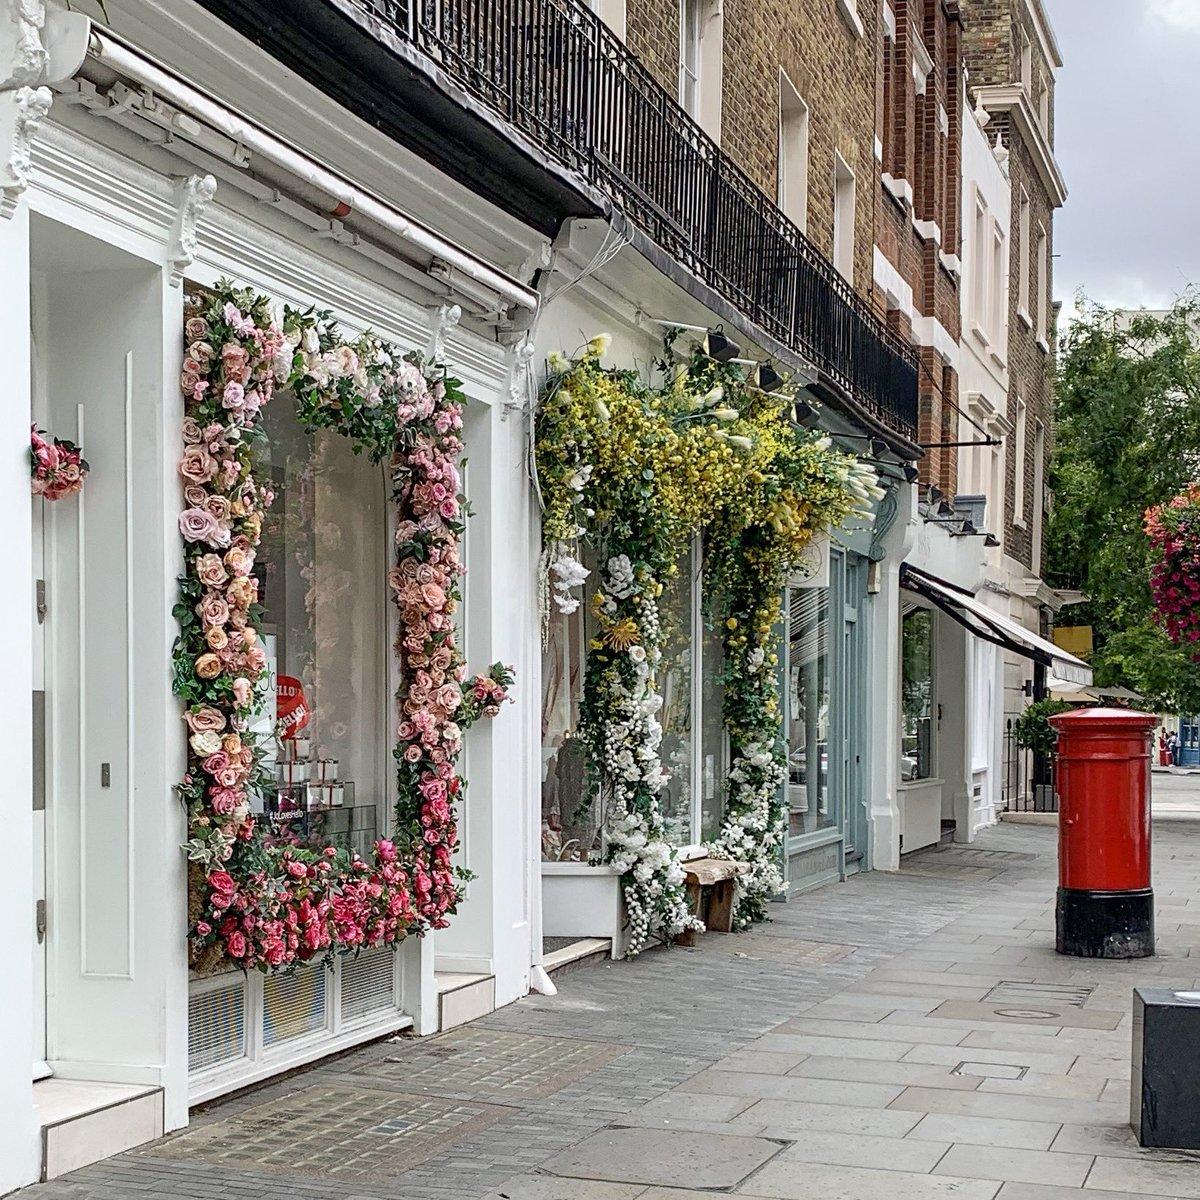 London's Elizabeth Street has such pretty flowers 💐 https://t.co/cYtPX8ugVh